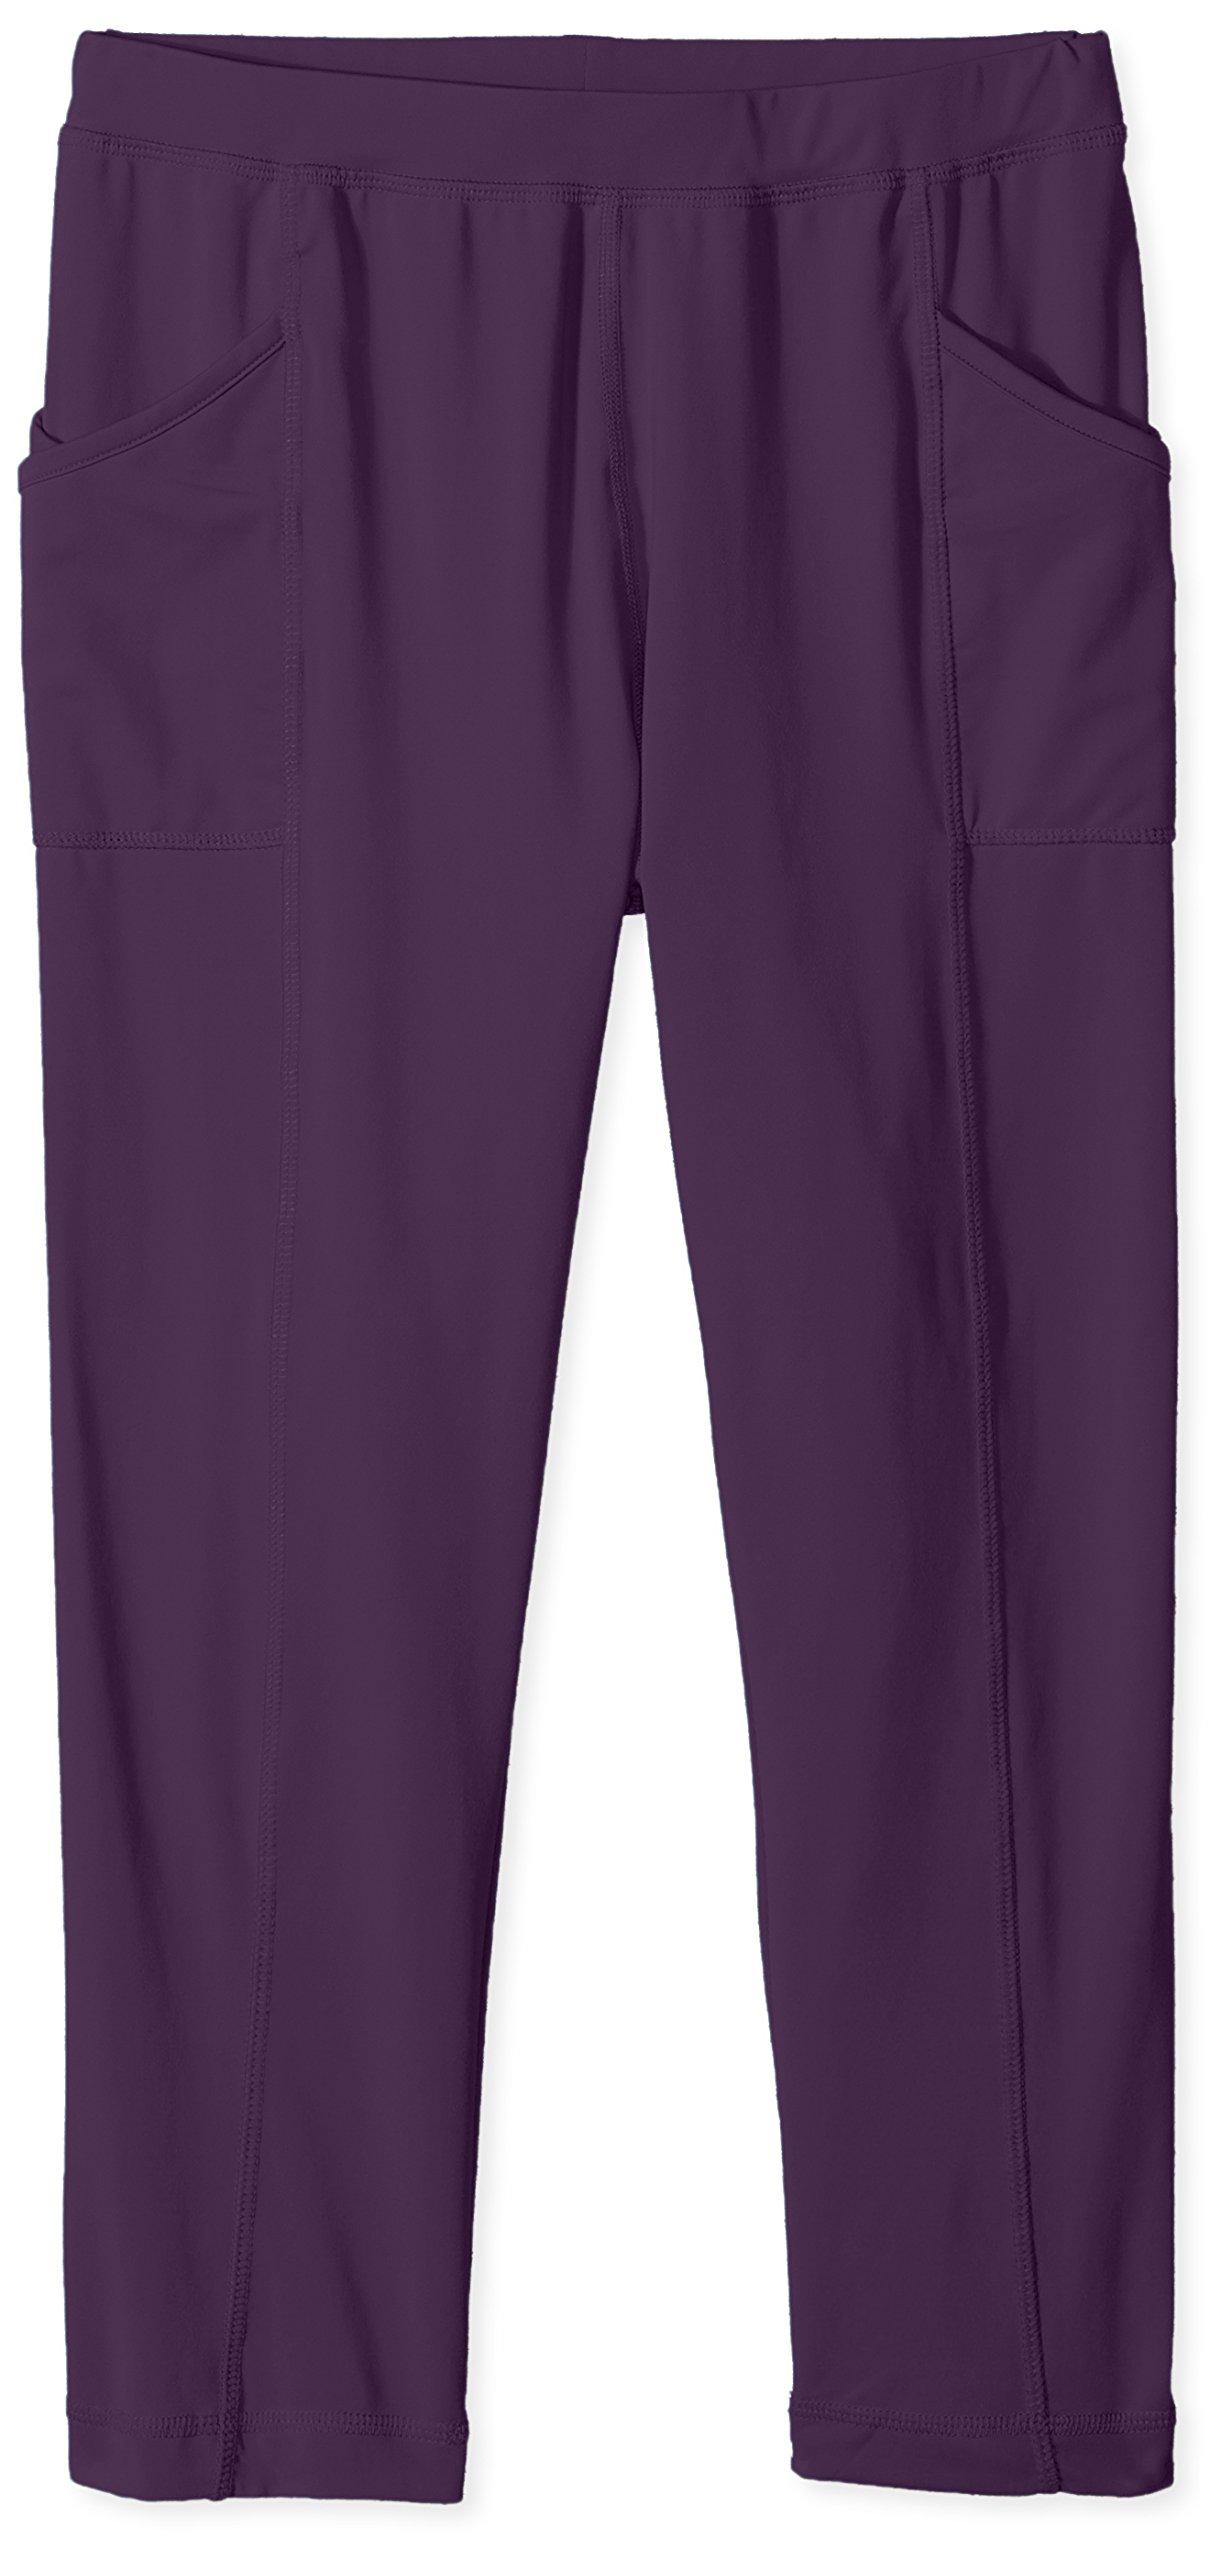 White Sierra Girl's Bug Free Leggings, Shadow Purple, Small by White Sierra (Image #1)